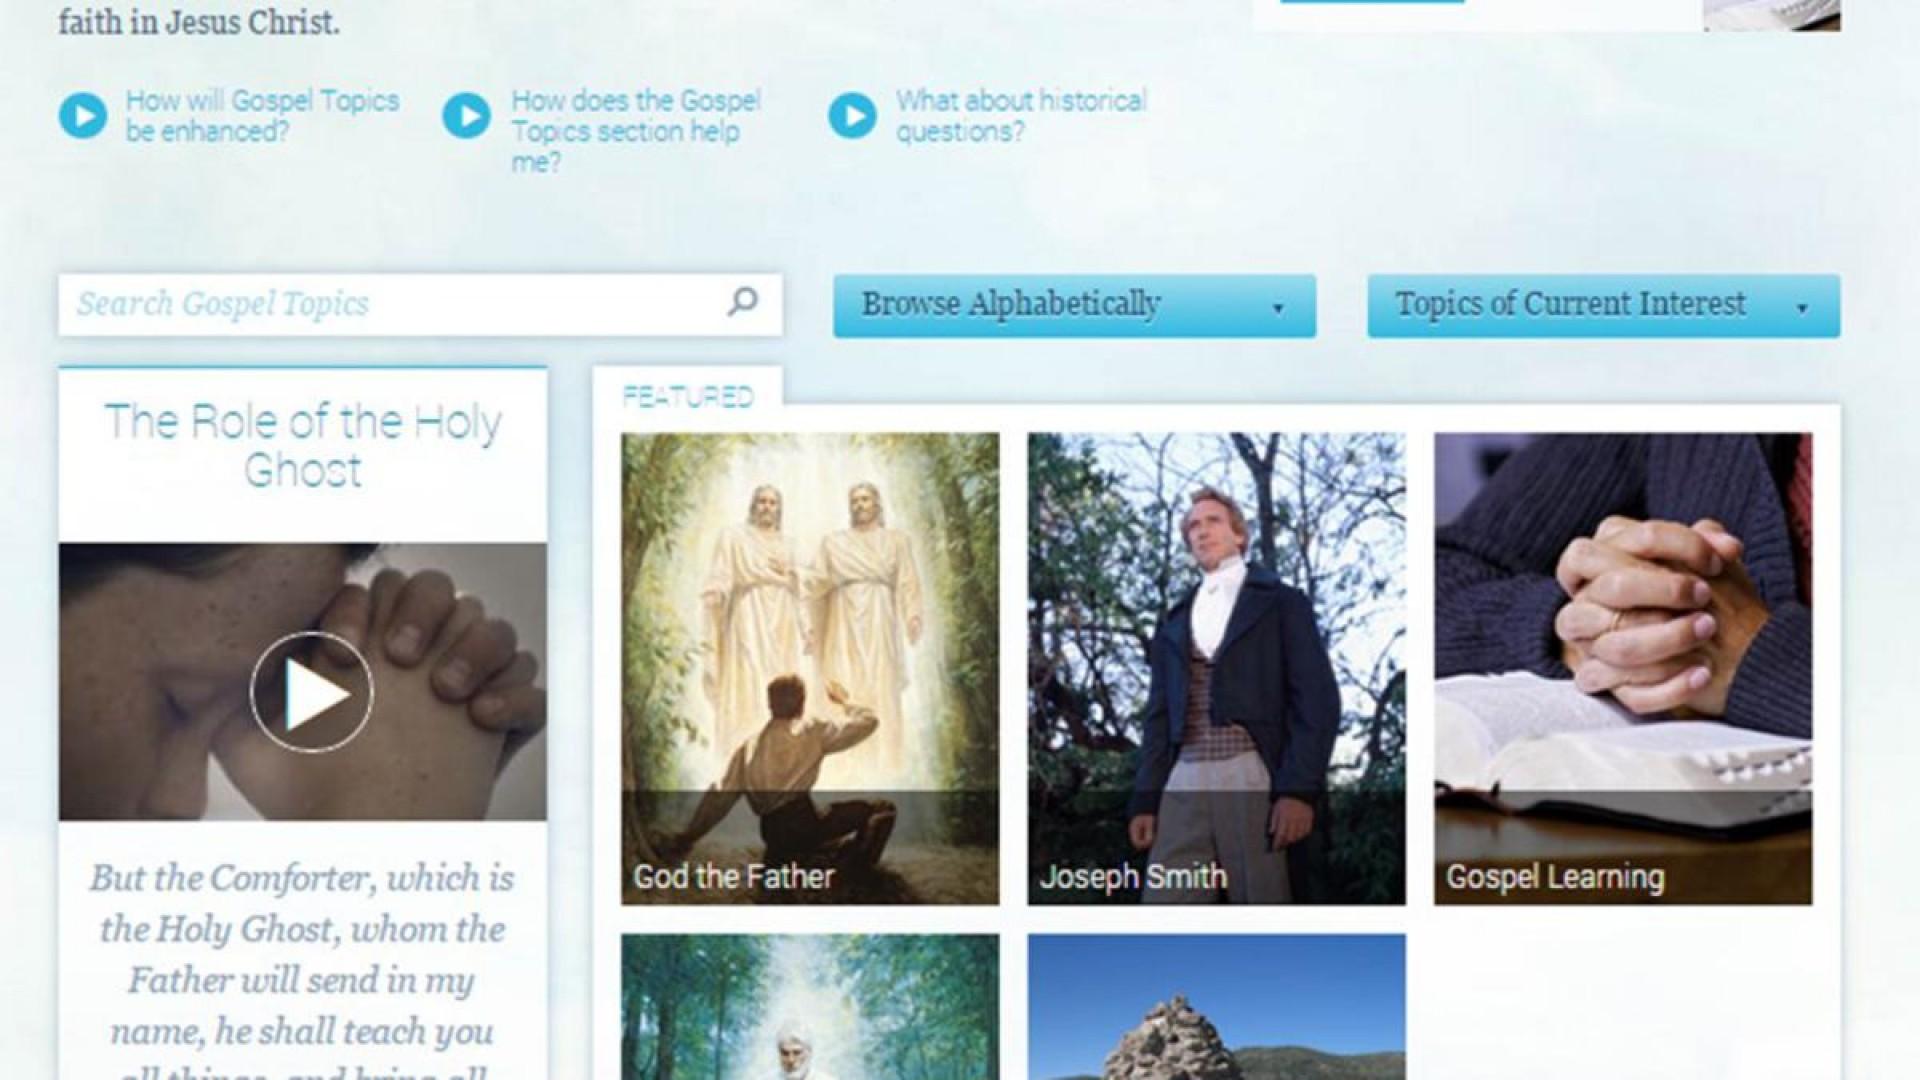 020 Lds Org Essays Gospel Topics Page Essay Wondrous Lds.org On Polygamy 1920